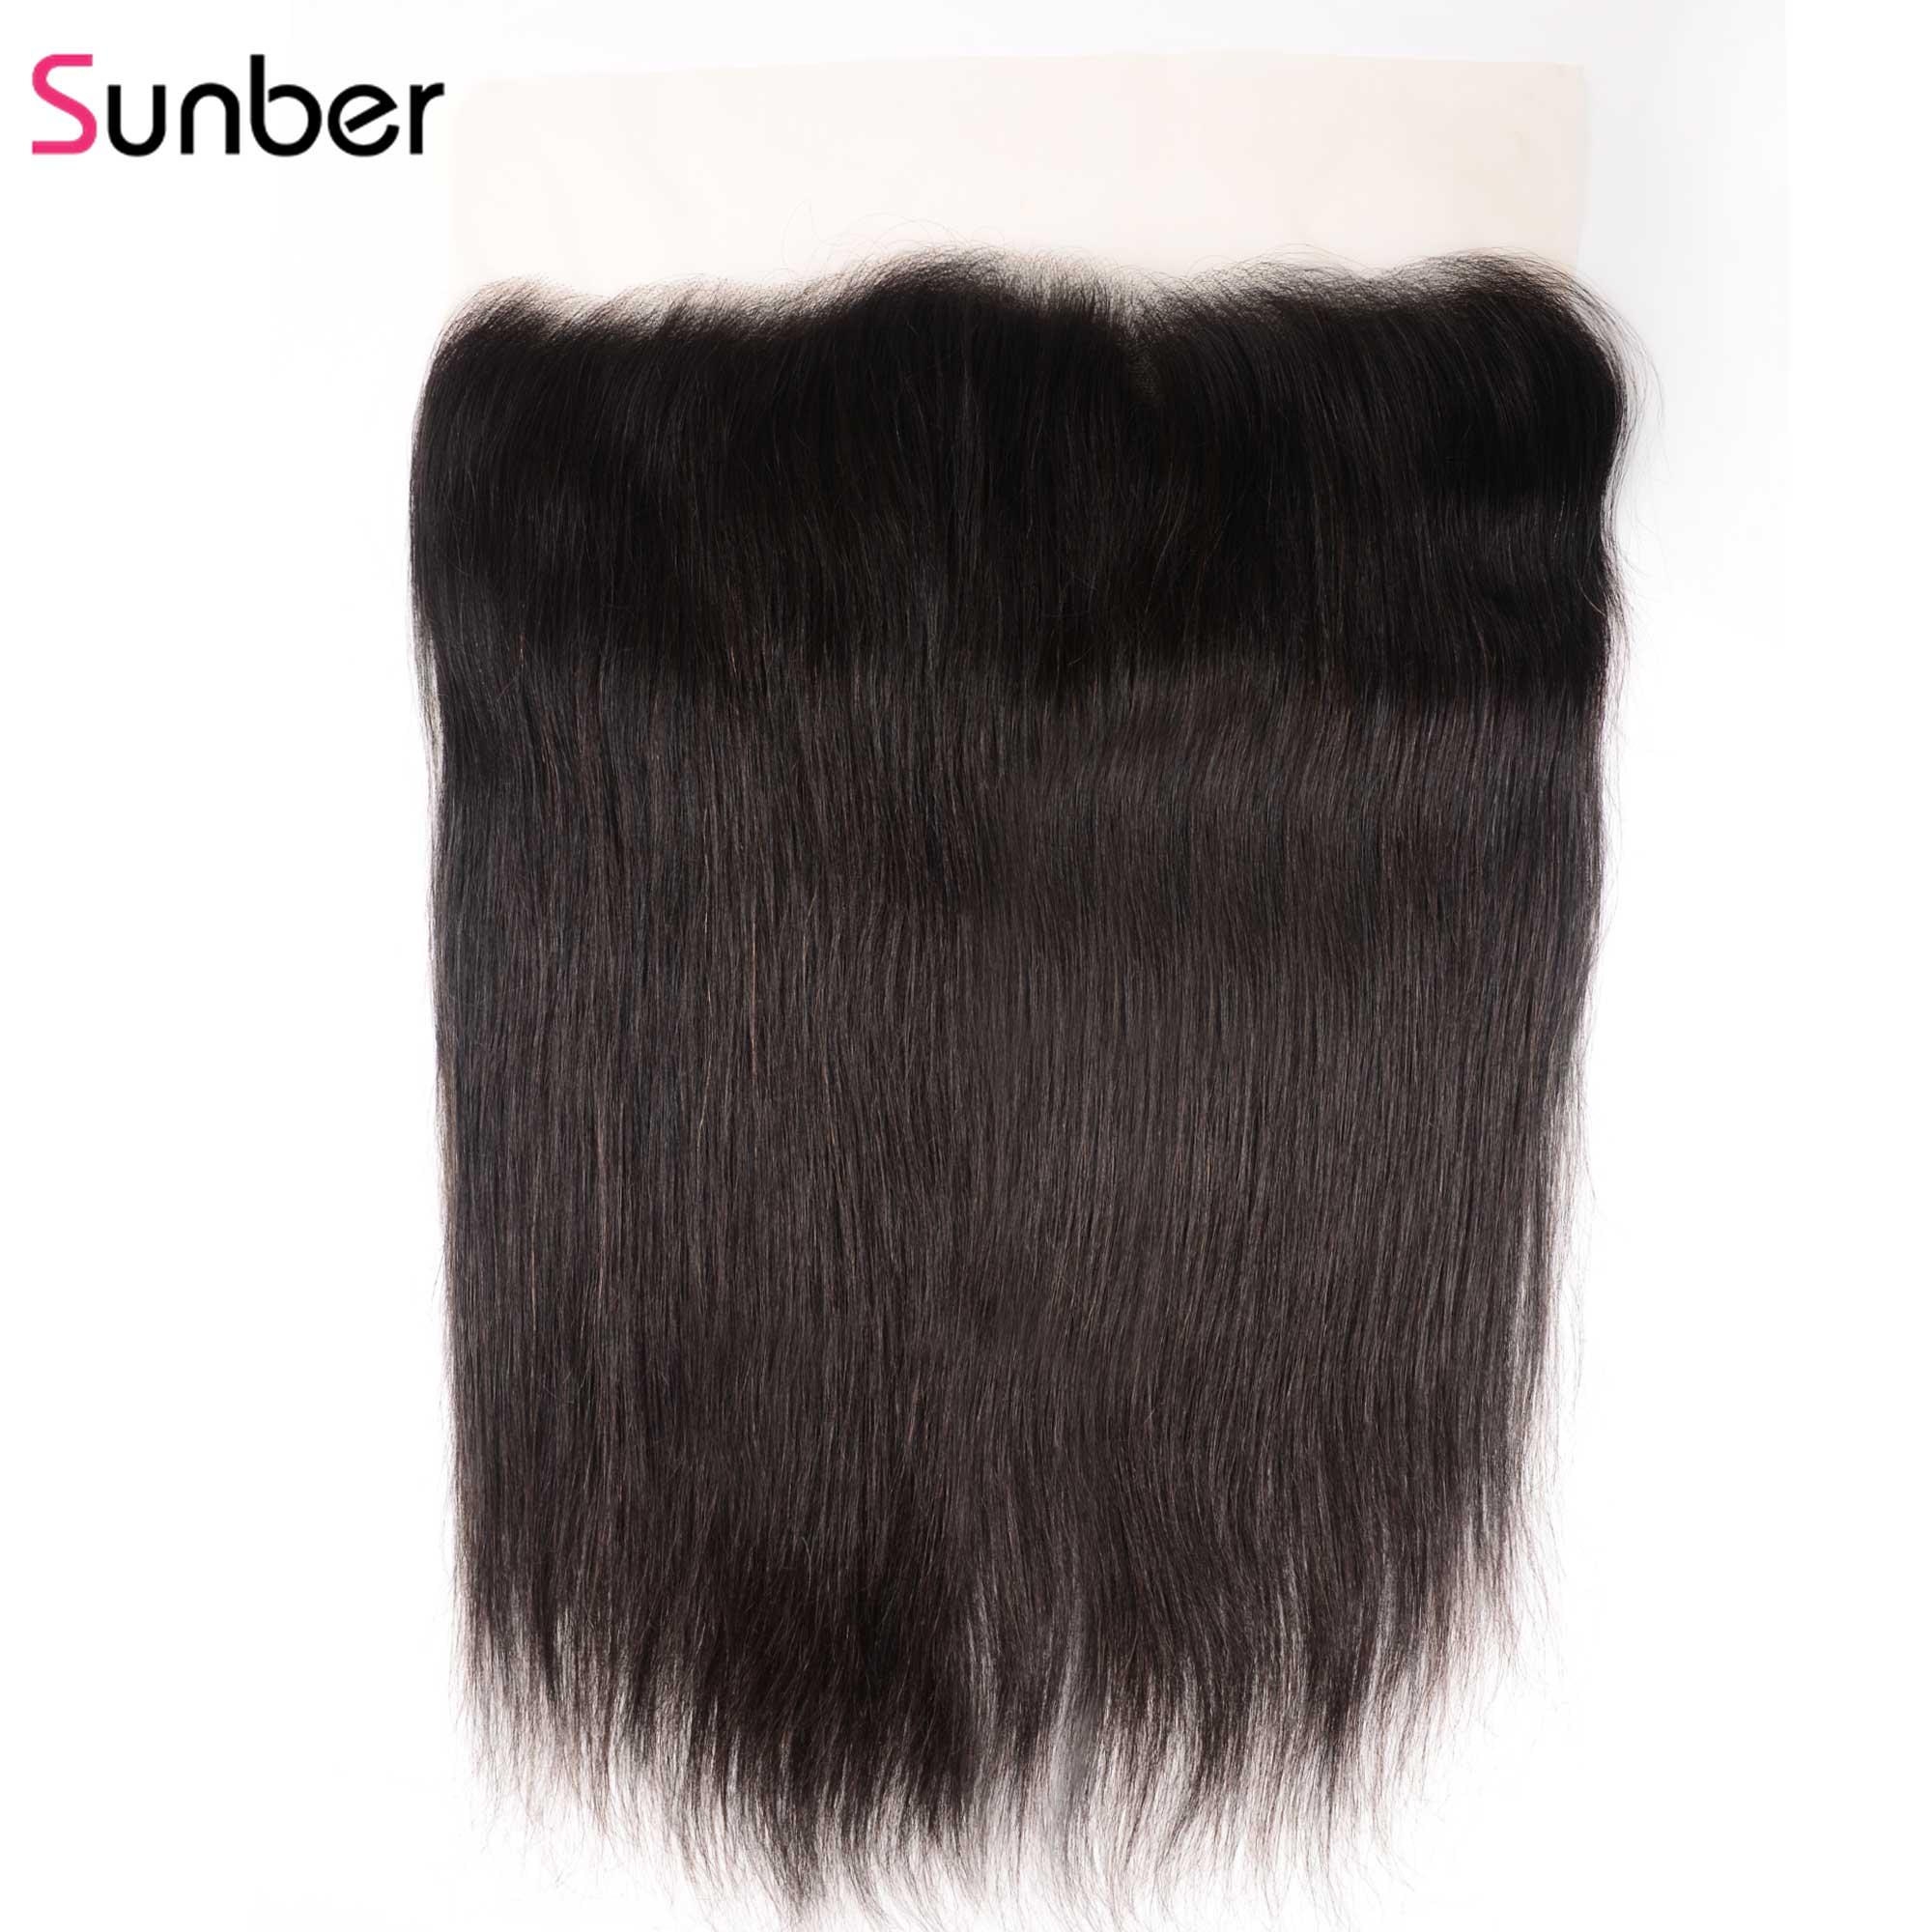 Sunber Hair13x6 transprent encaje Frontal pelo recto 100% cabello humano Remy oreja a oreja Cierre de encaje pelo peruano